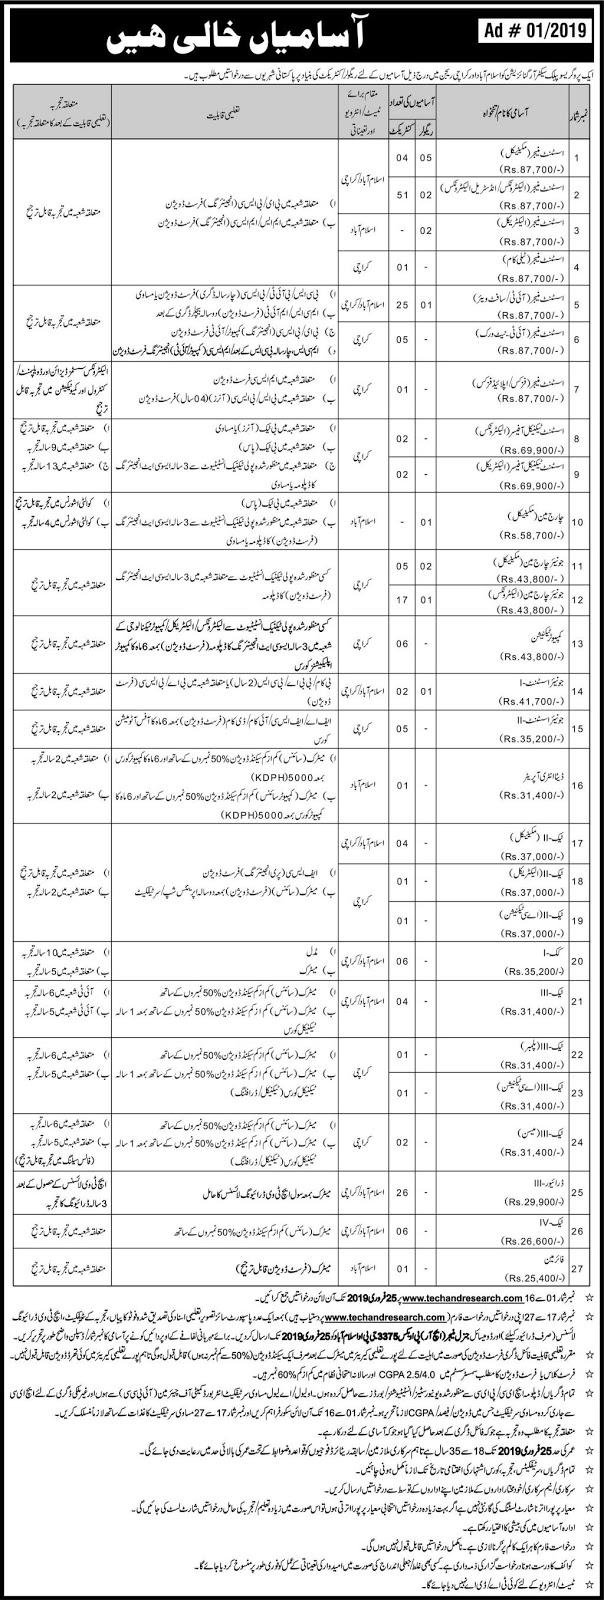 Public sector organization jobs 2019 | P.O Box 3375 Islamabad | 195+ Vacancies by Federal Govt Organization